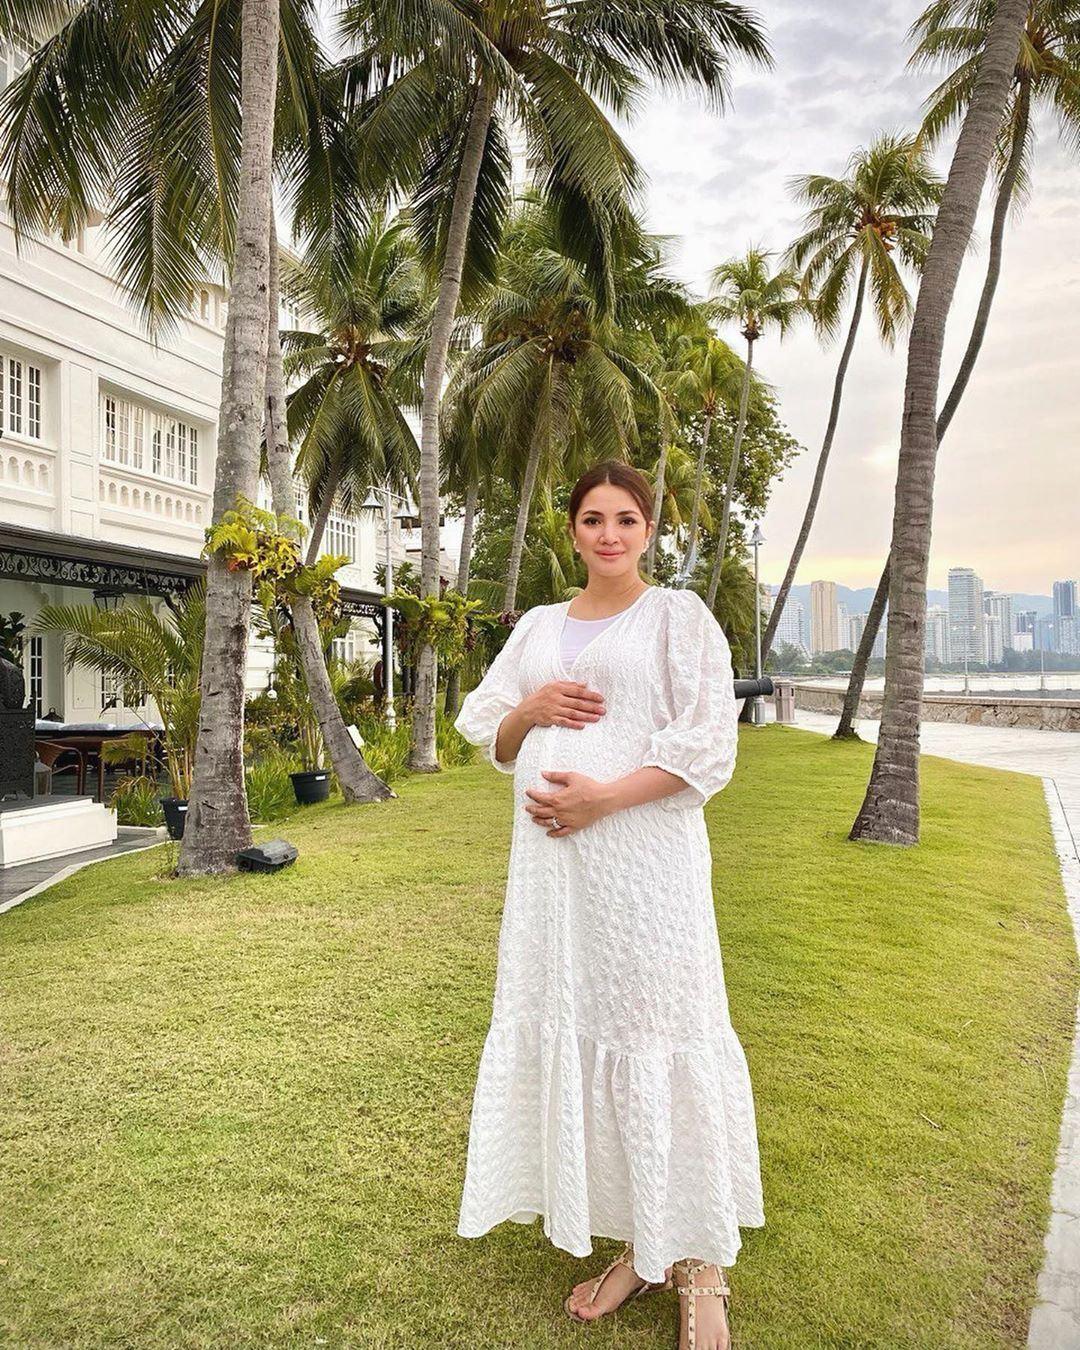 masuk tujuh bulan hamil, fattah amin akui mood isteri berubah-ubah